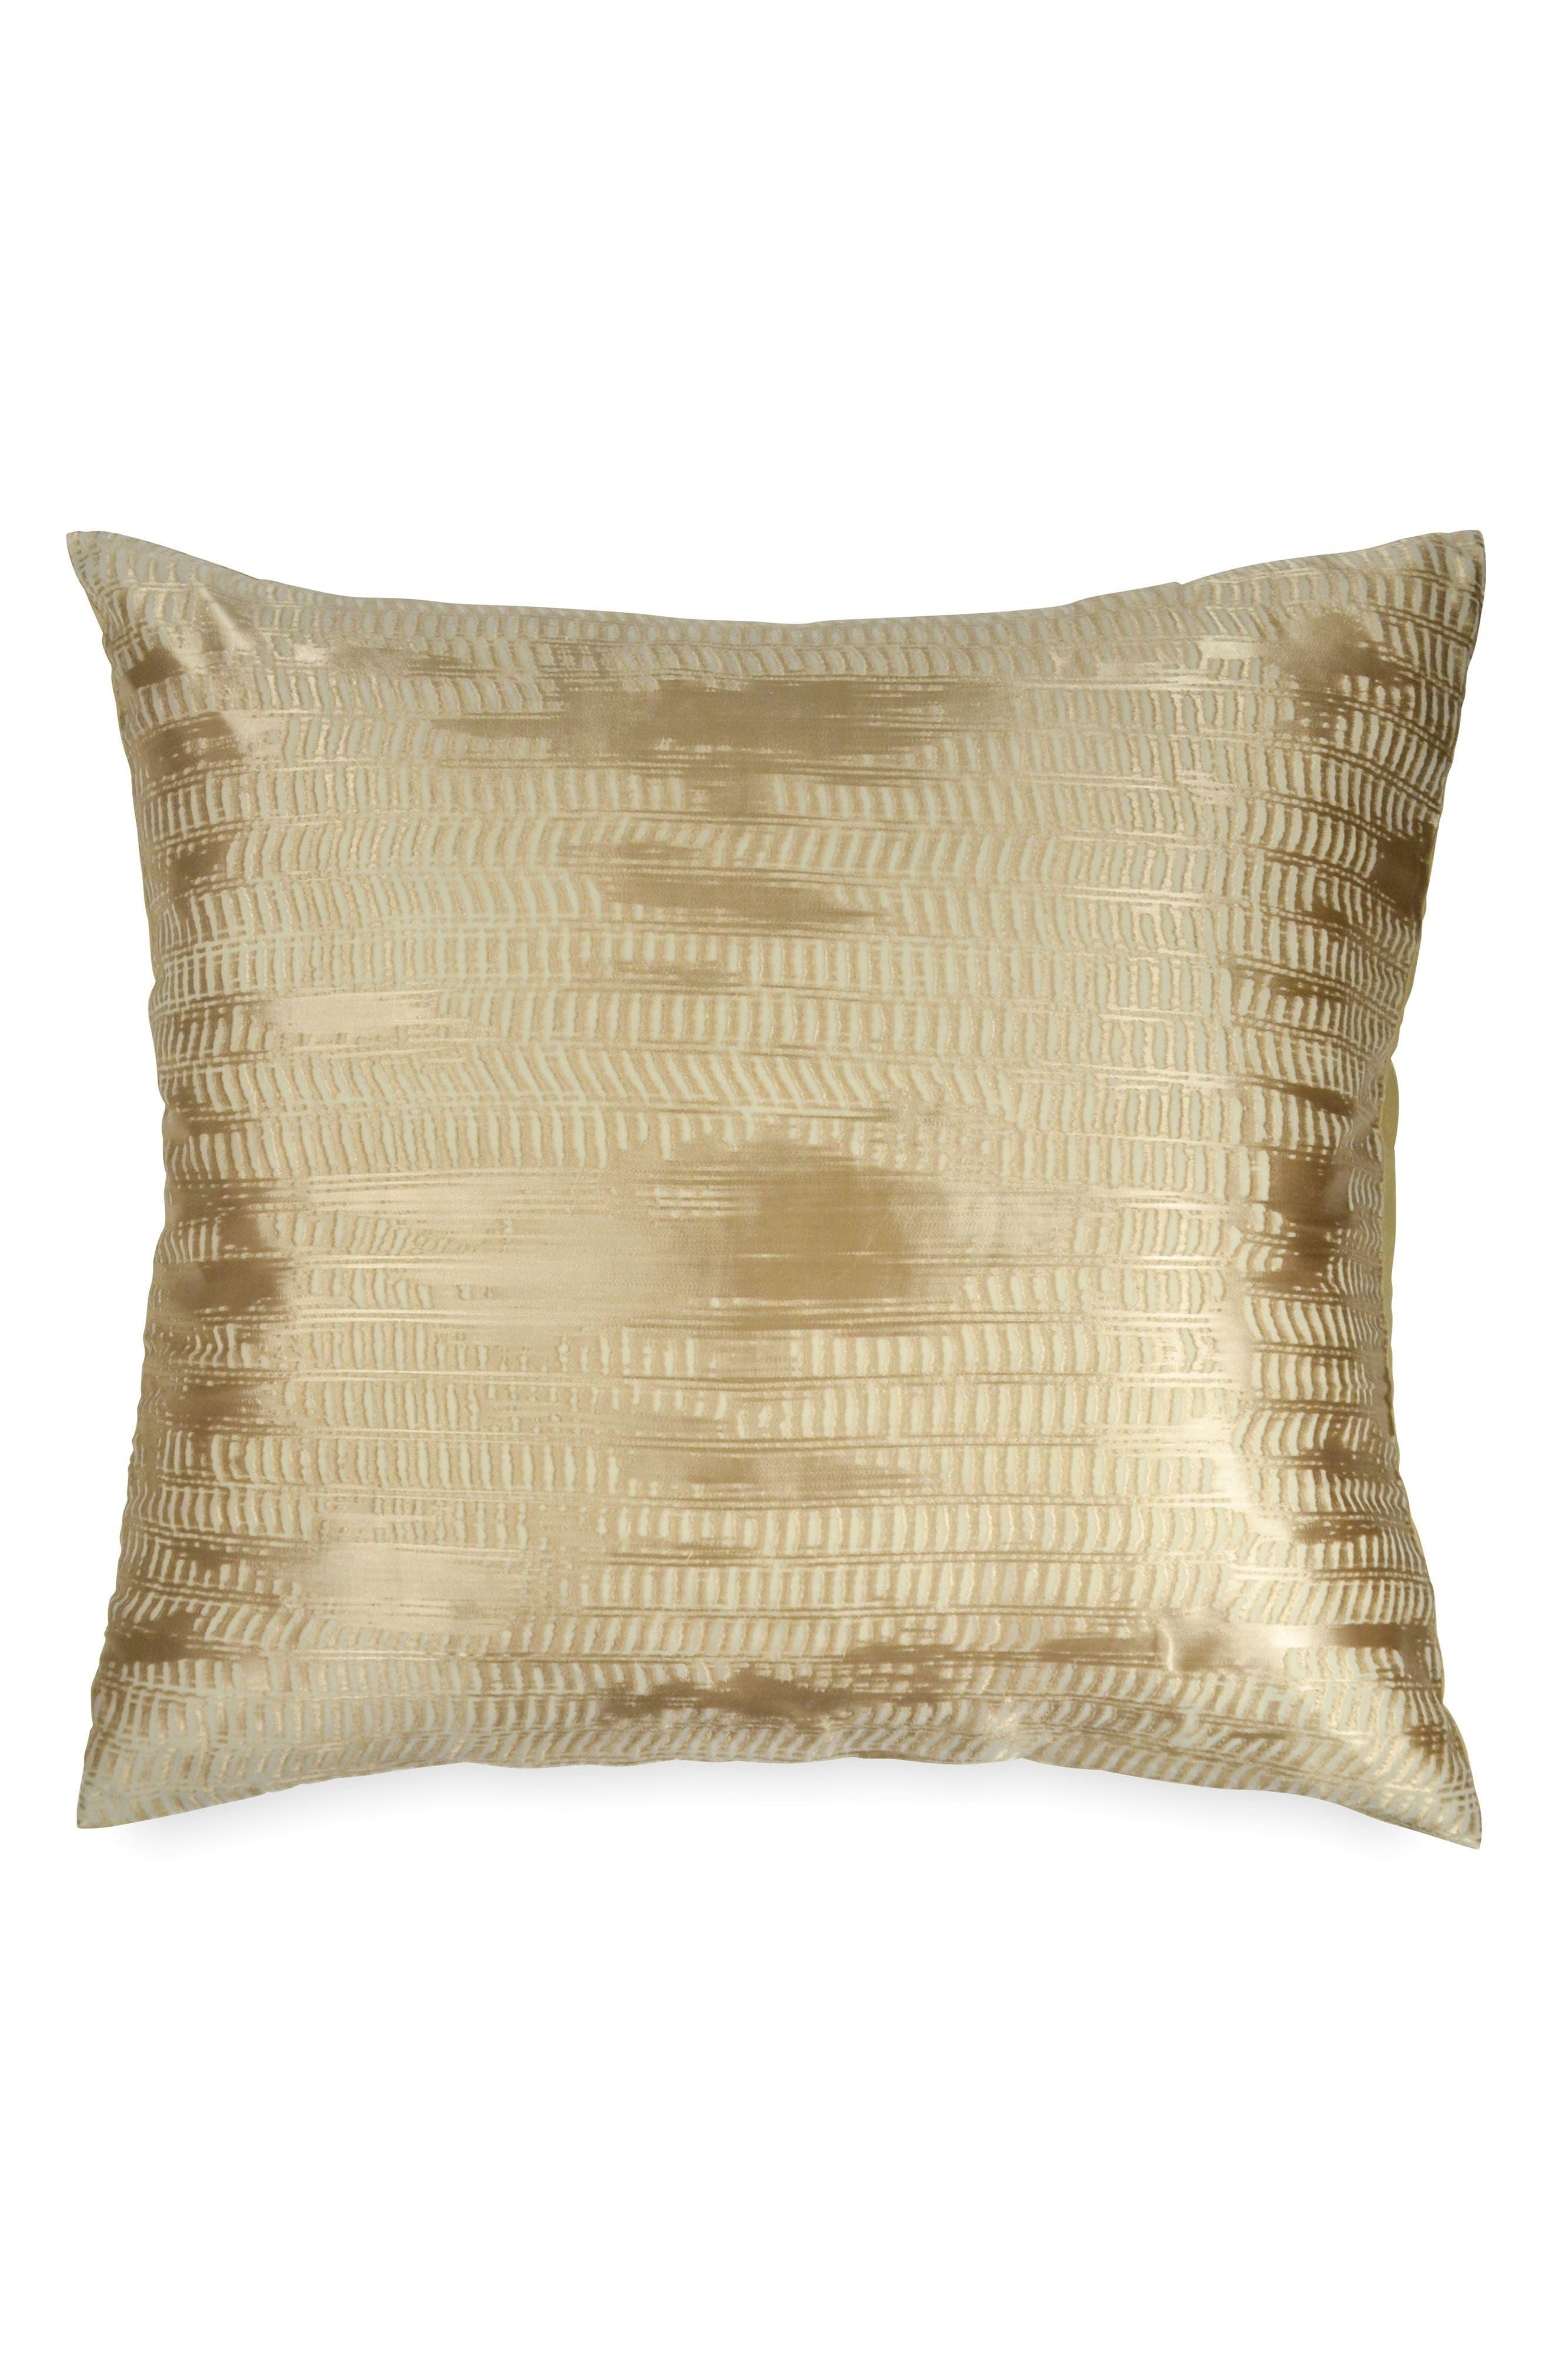 Donna Karan Vapor Euro Sham,                         Main,                         color, Gold Dust